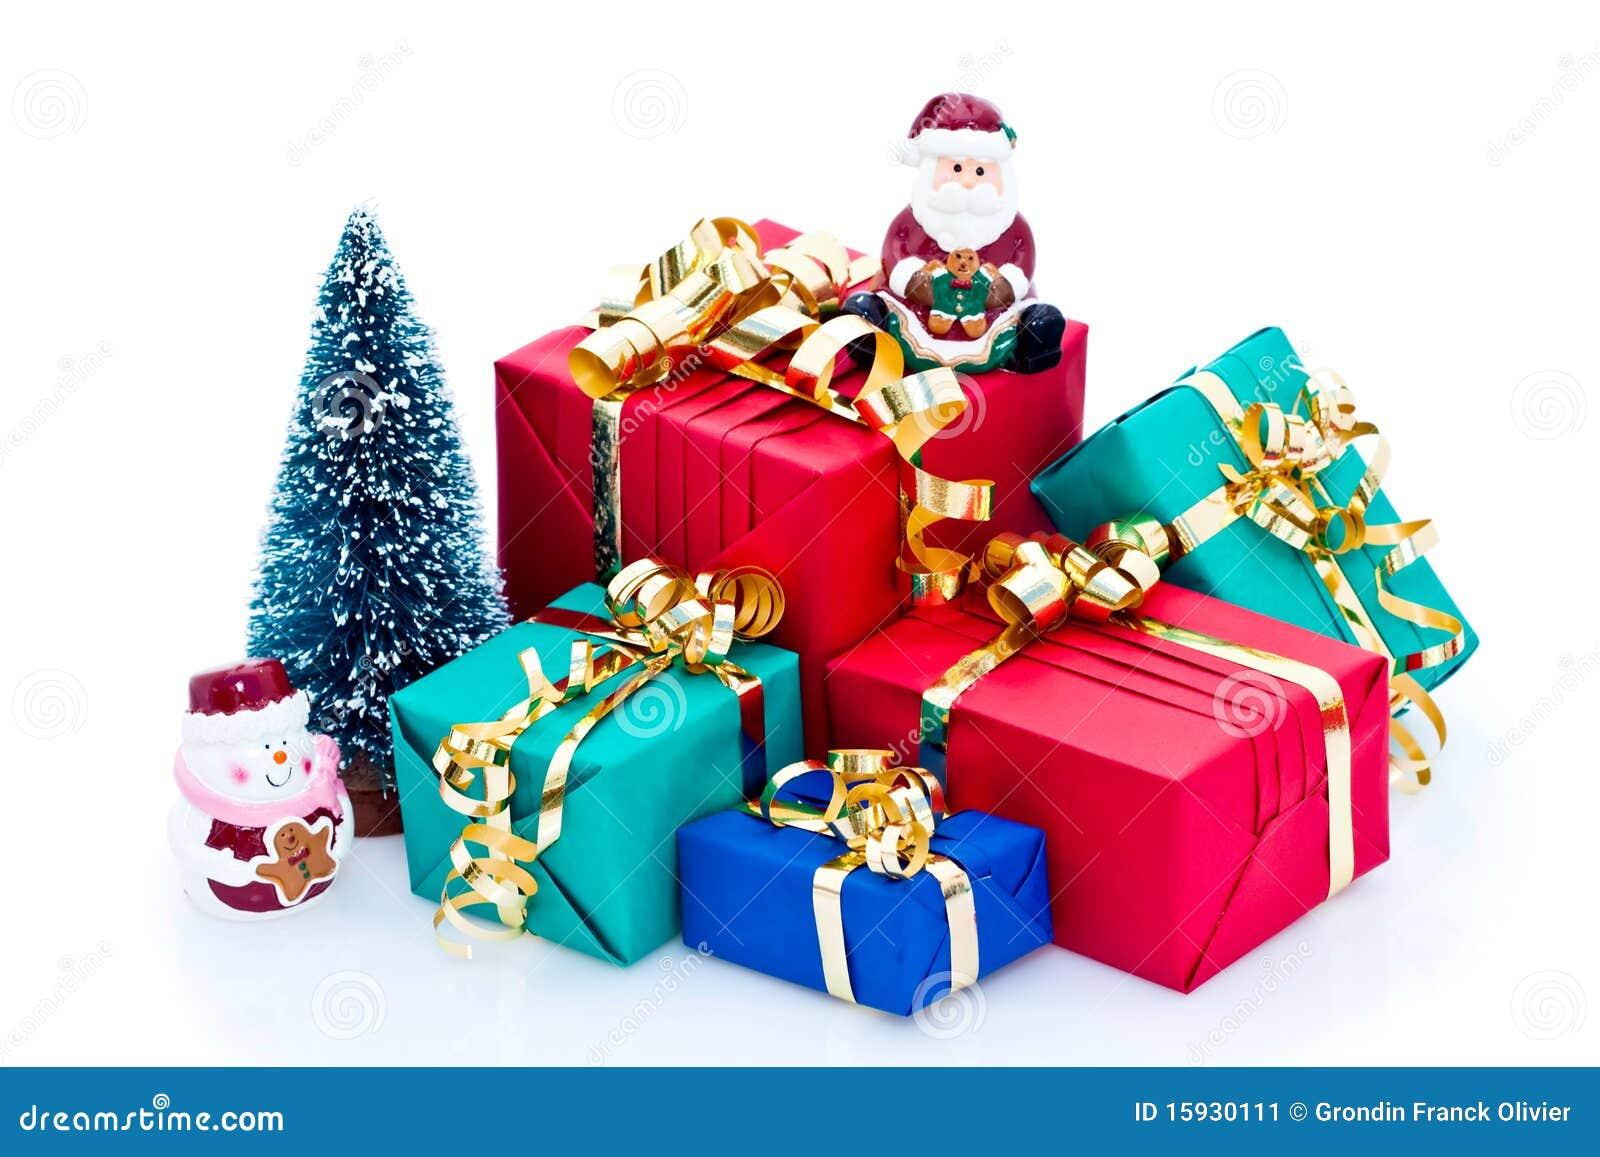 Pile Of Christmas Presents Stock Image - Image: 15930111